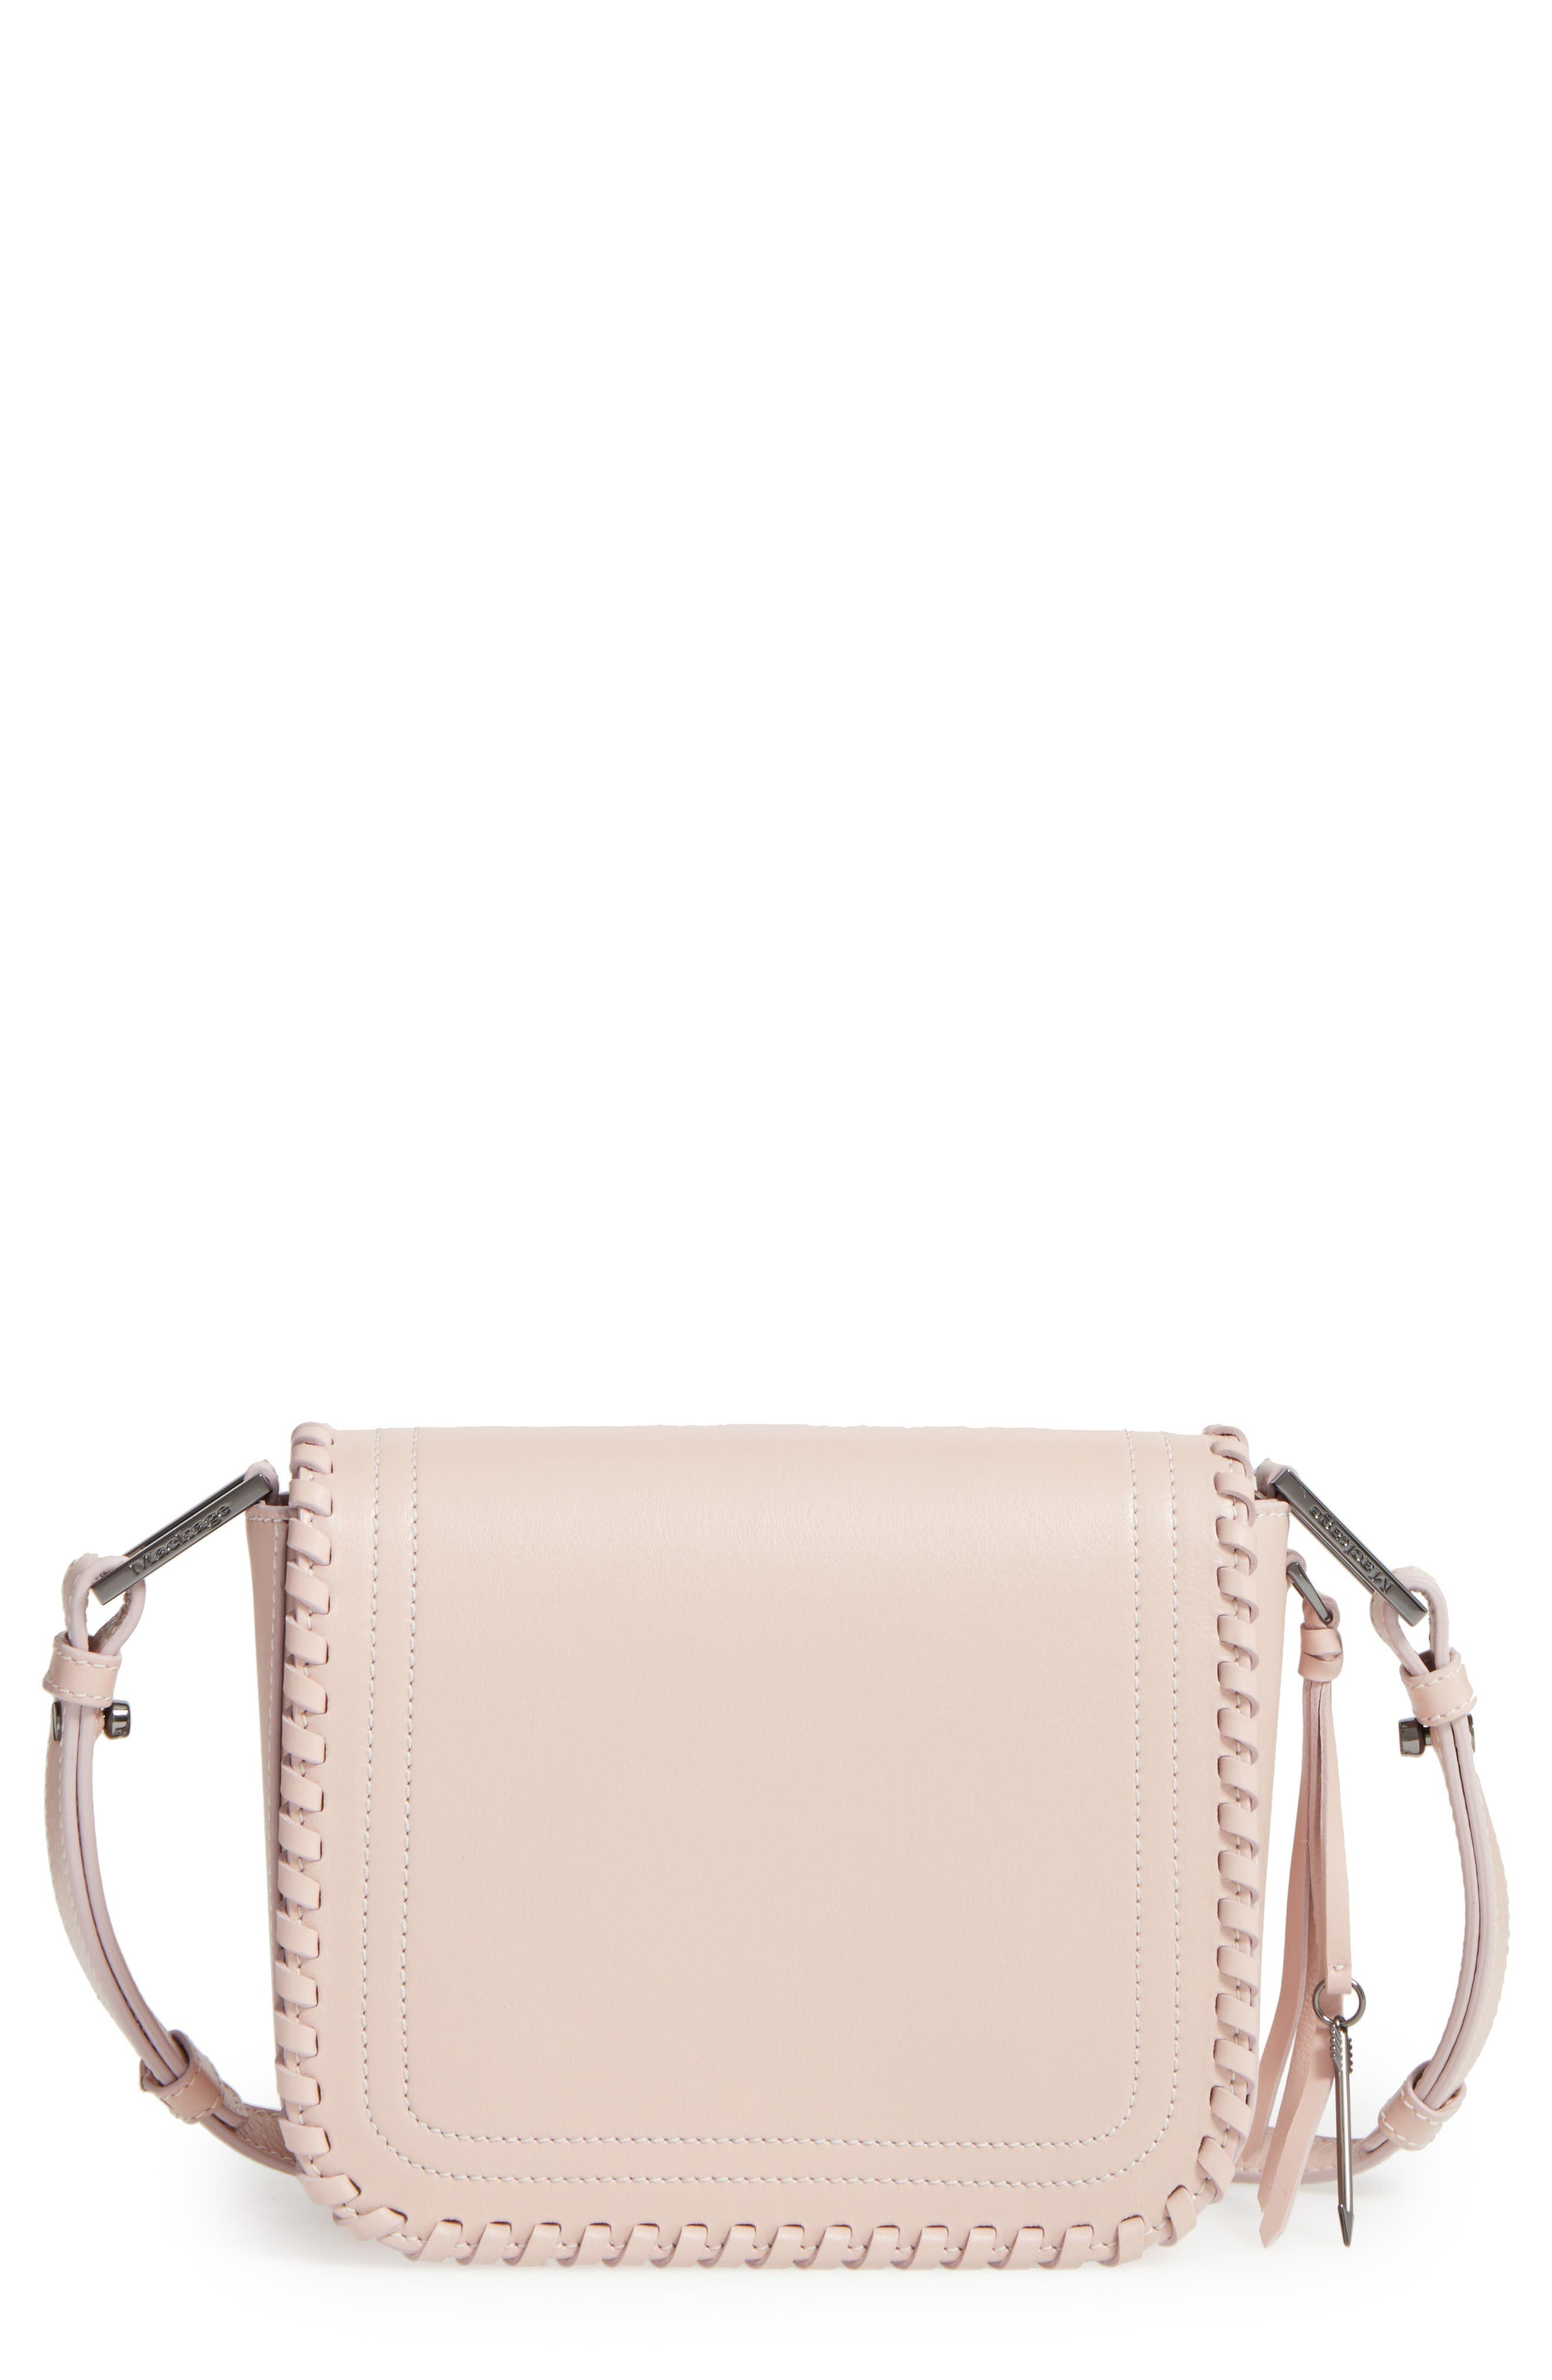 Mackage Nova Leather Crossbody Bag